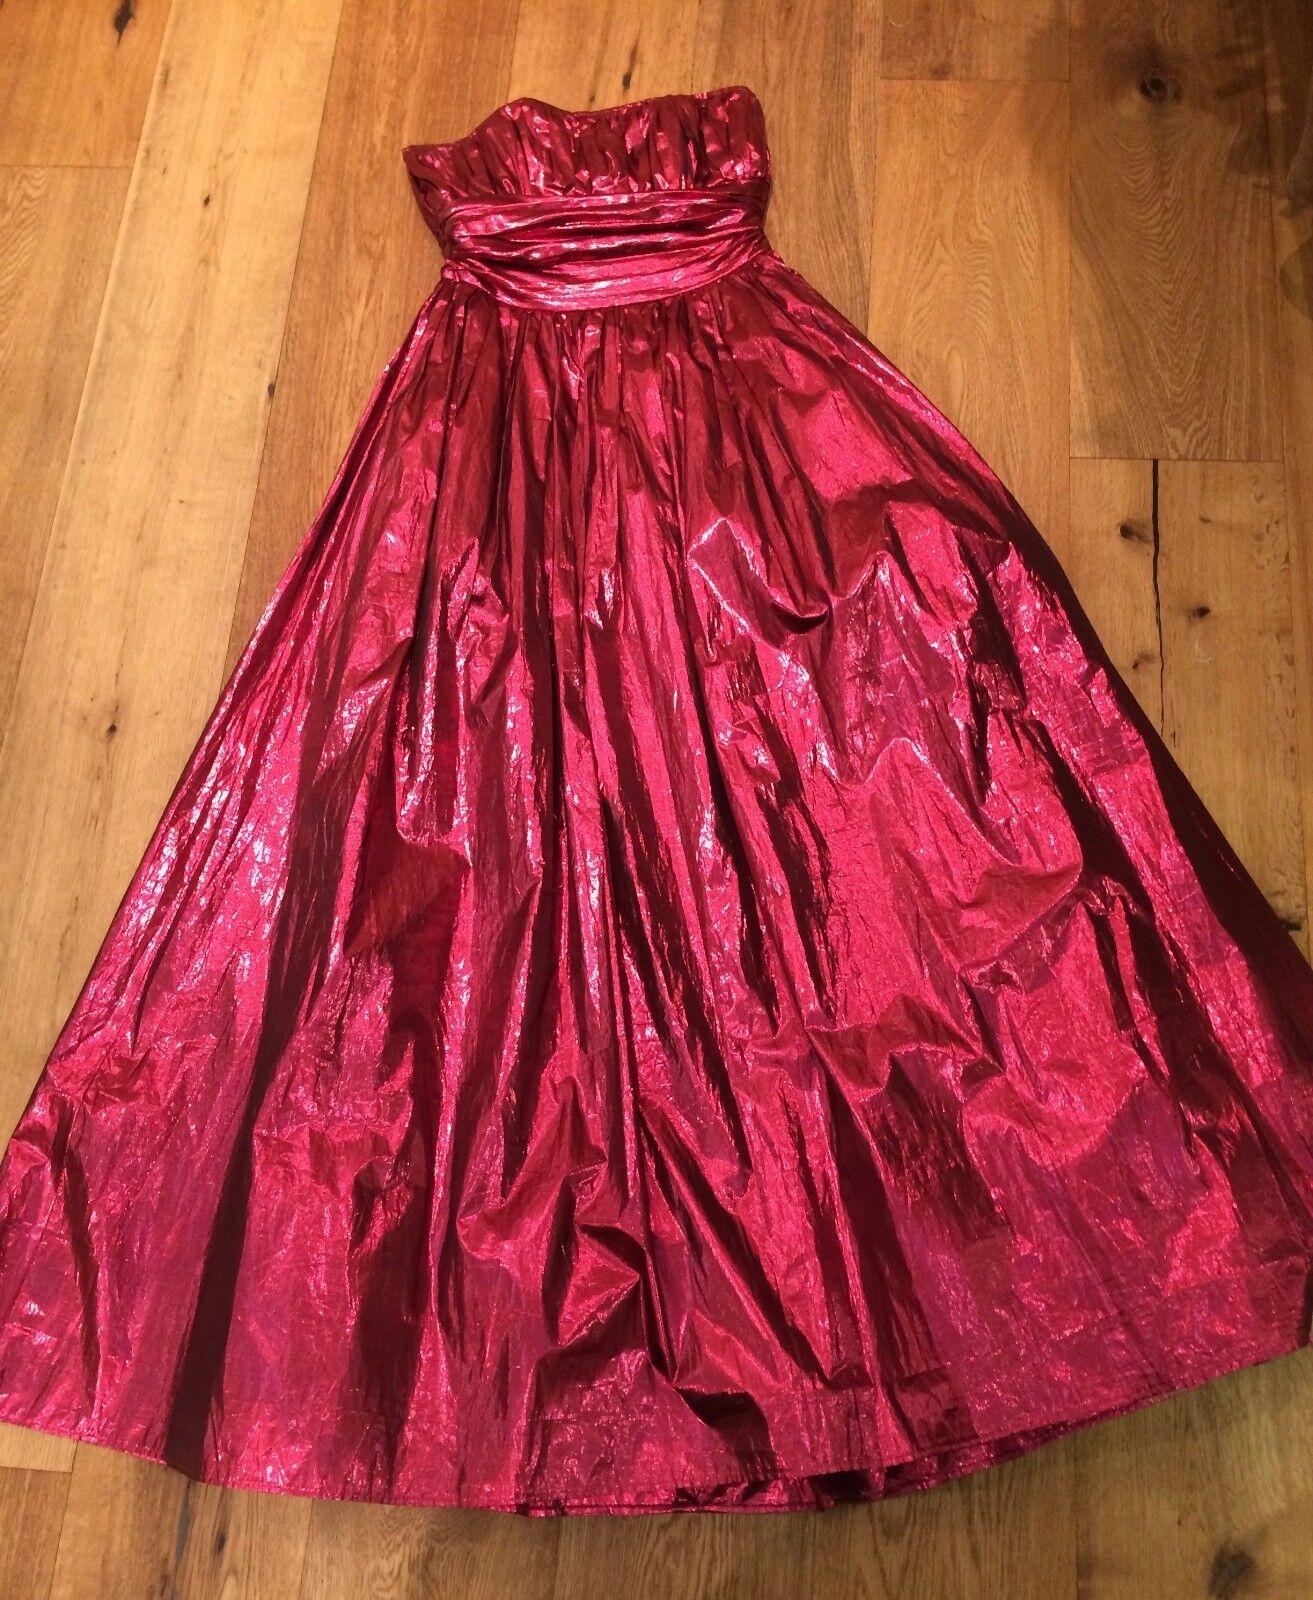 Abendkleid, Modellkleid, Corsage, lang, Gr. 38, weinrot, Josh Charles